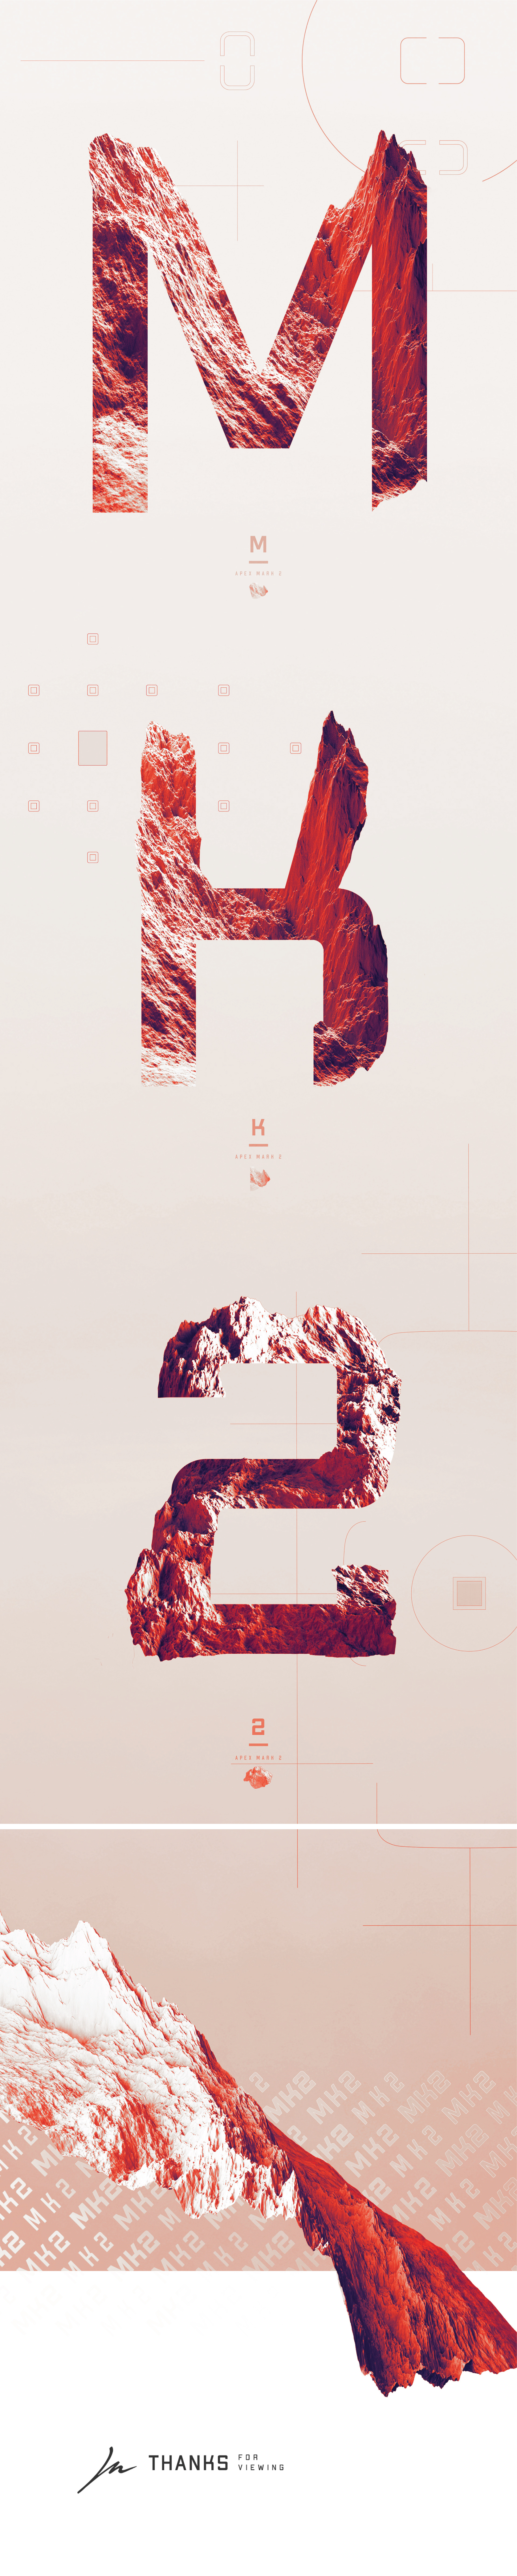 Apex-3-Long.jpg